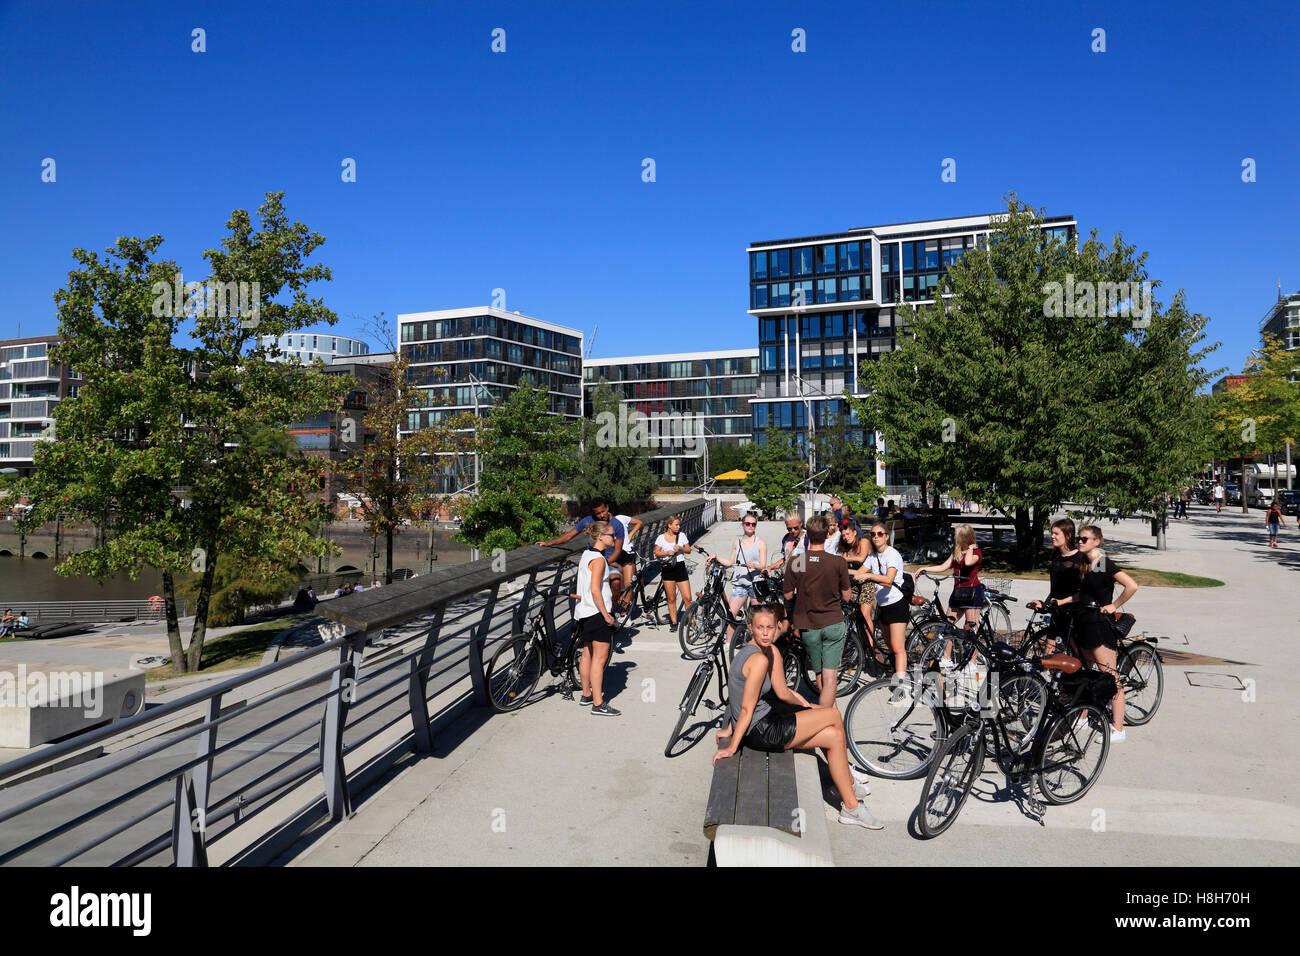 Guided bike tour, Marco Polo Terraces, Hafencity, Hamburg, Germany, Europe - Stock Image